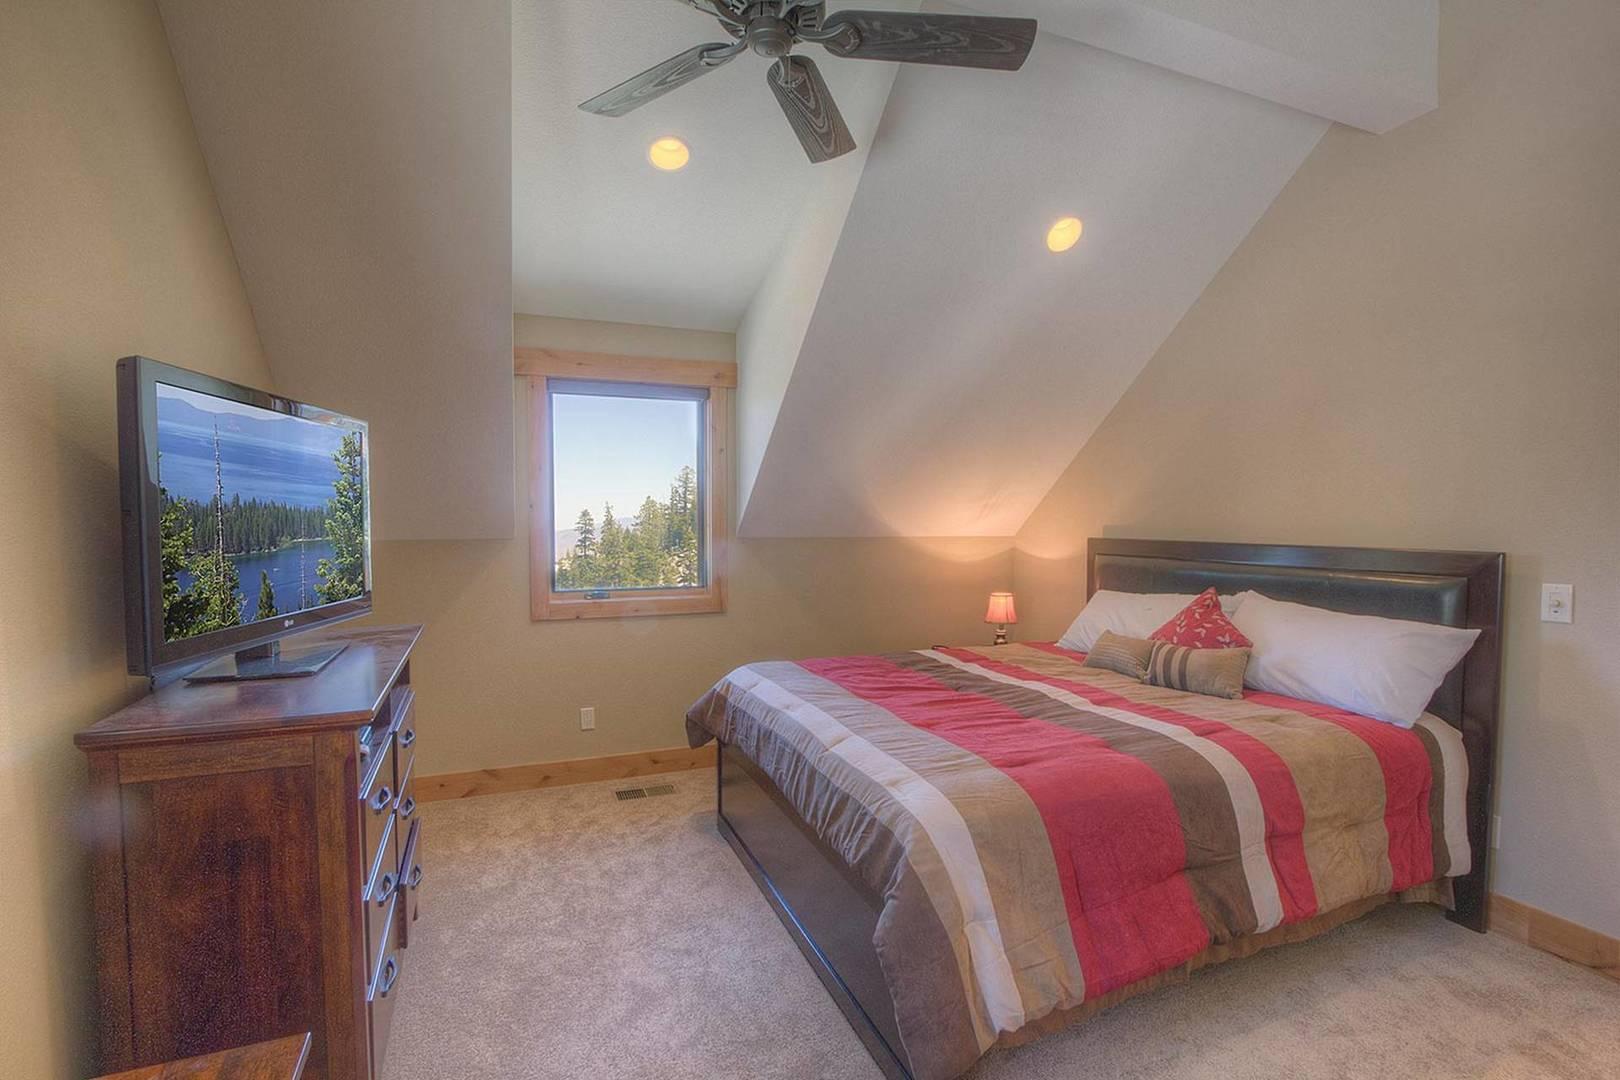 hnh1410 bedroom